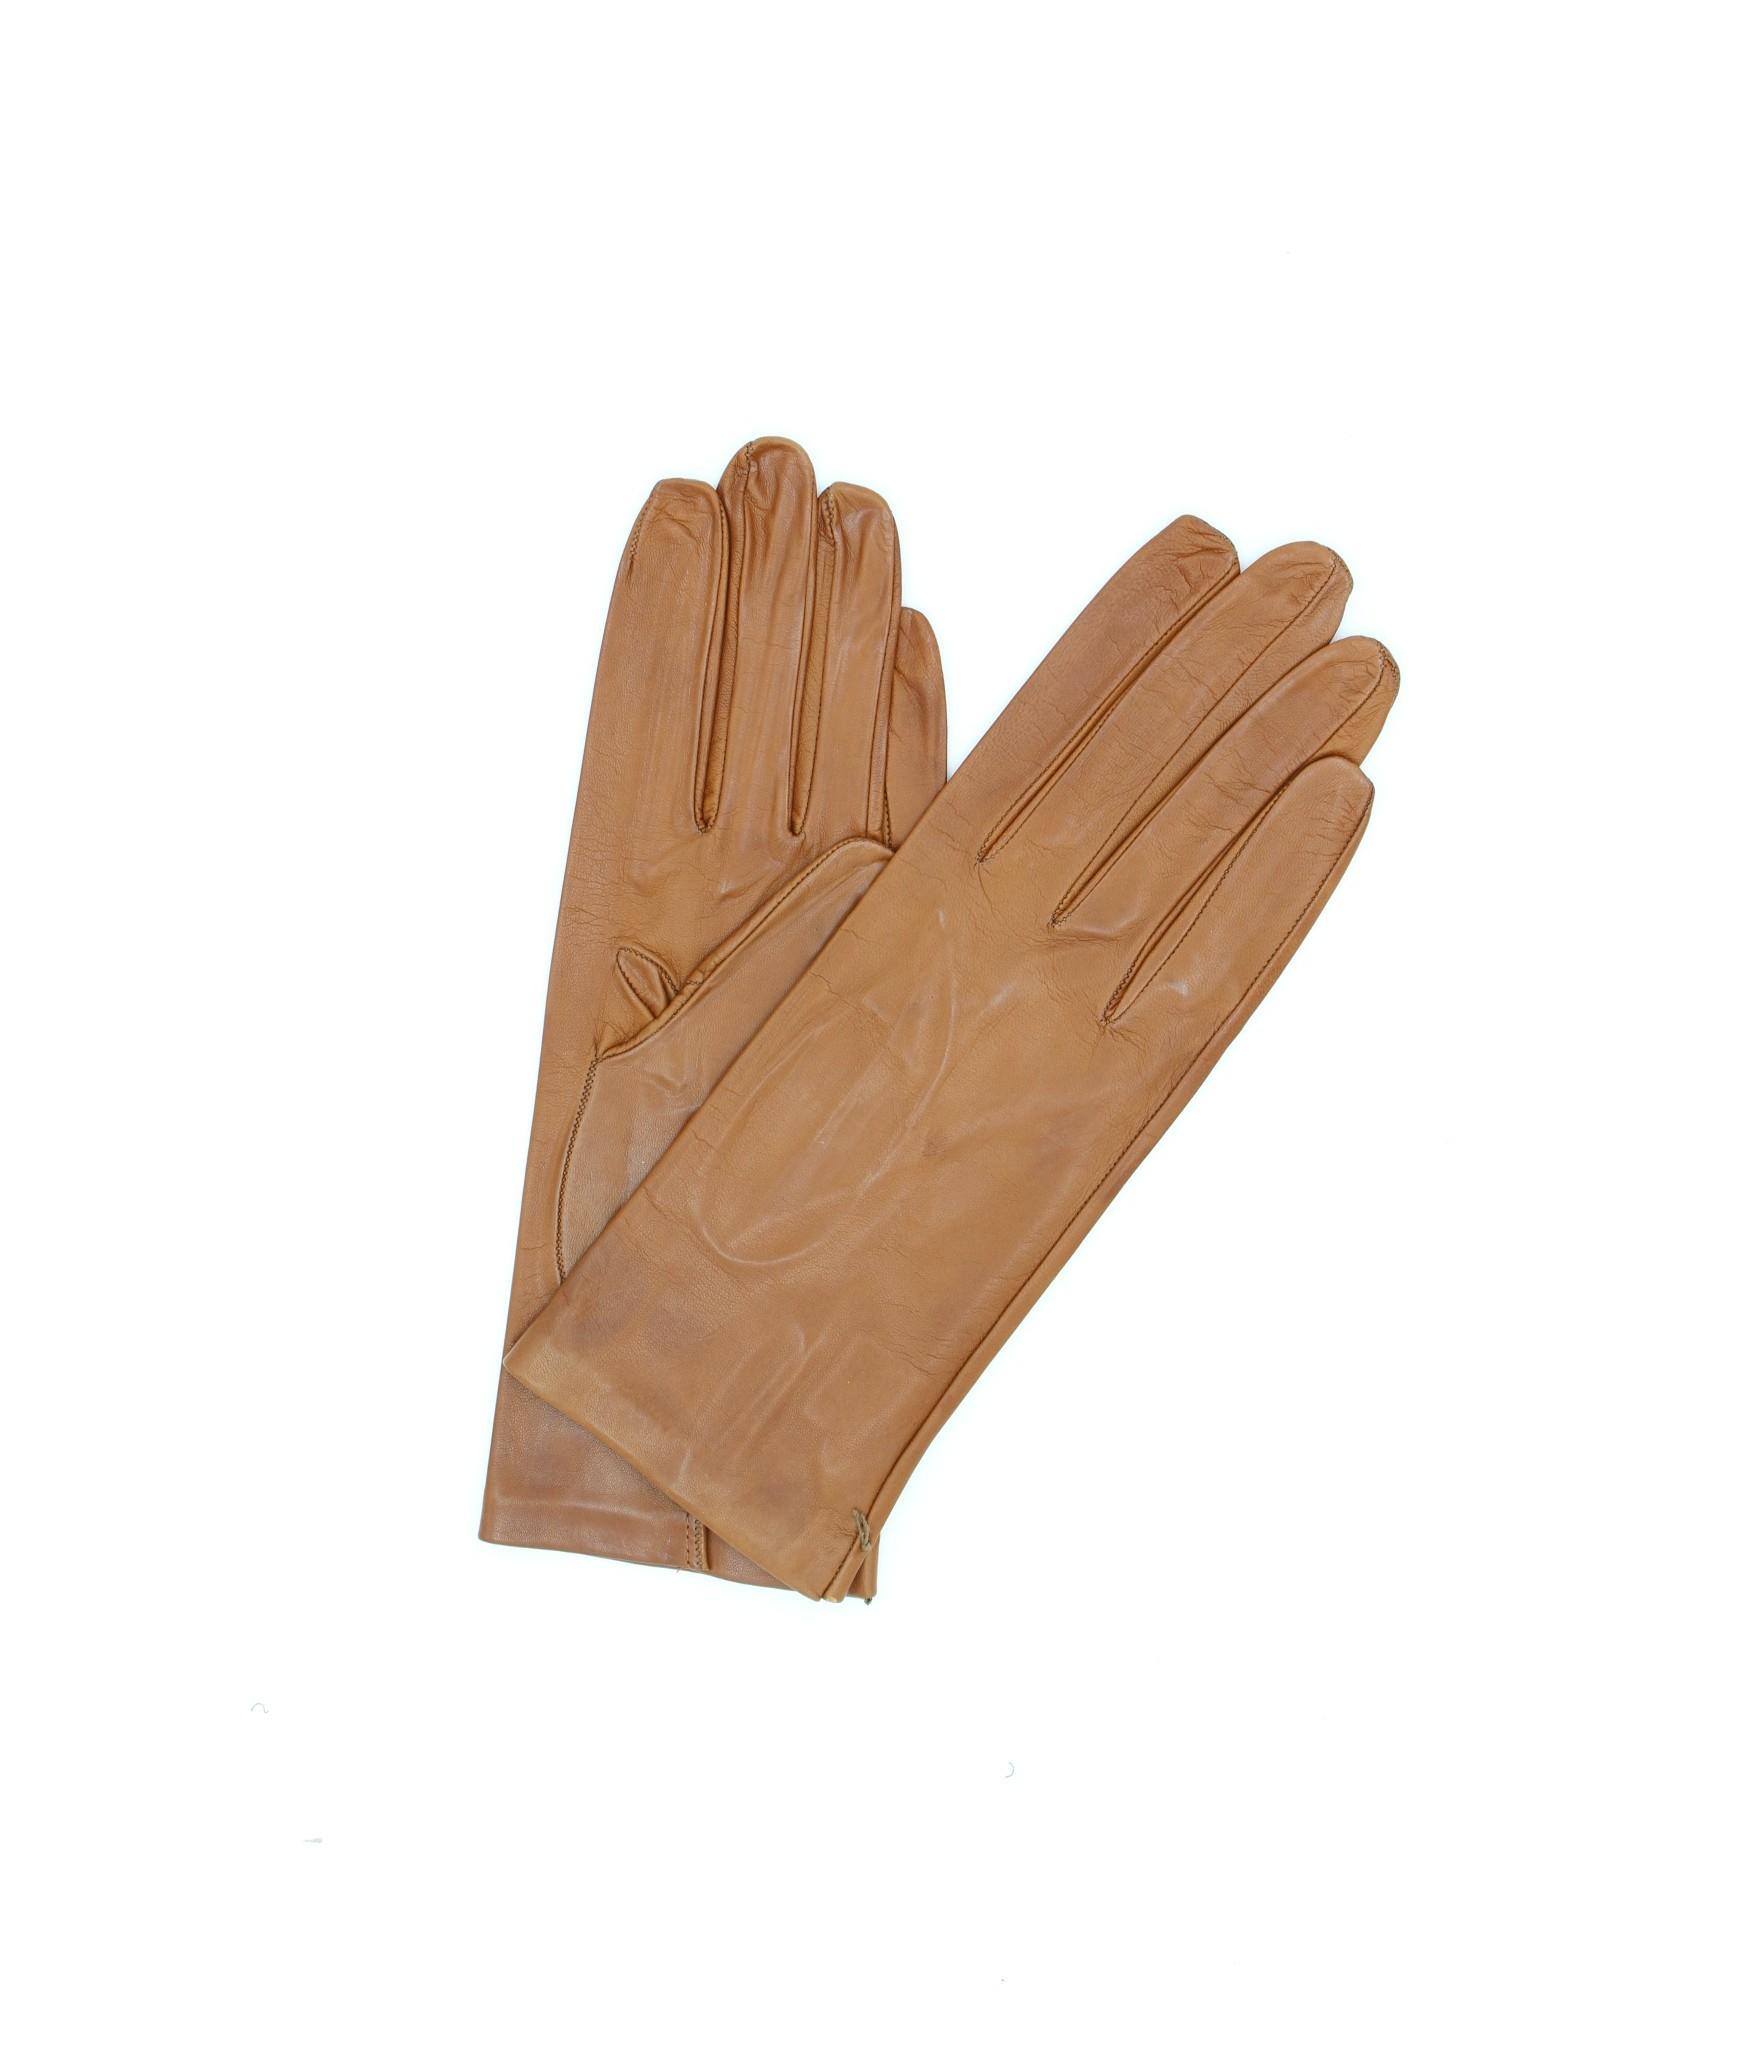 Nappa leather gloves 2bt unlined Tan Sermoneta Gloves Leather